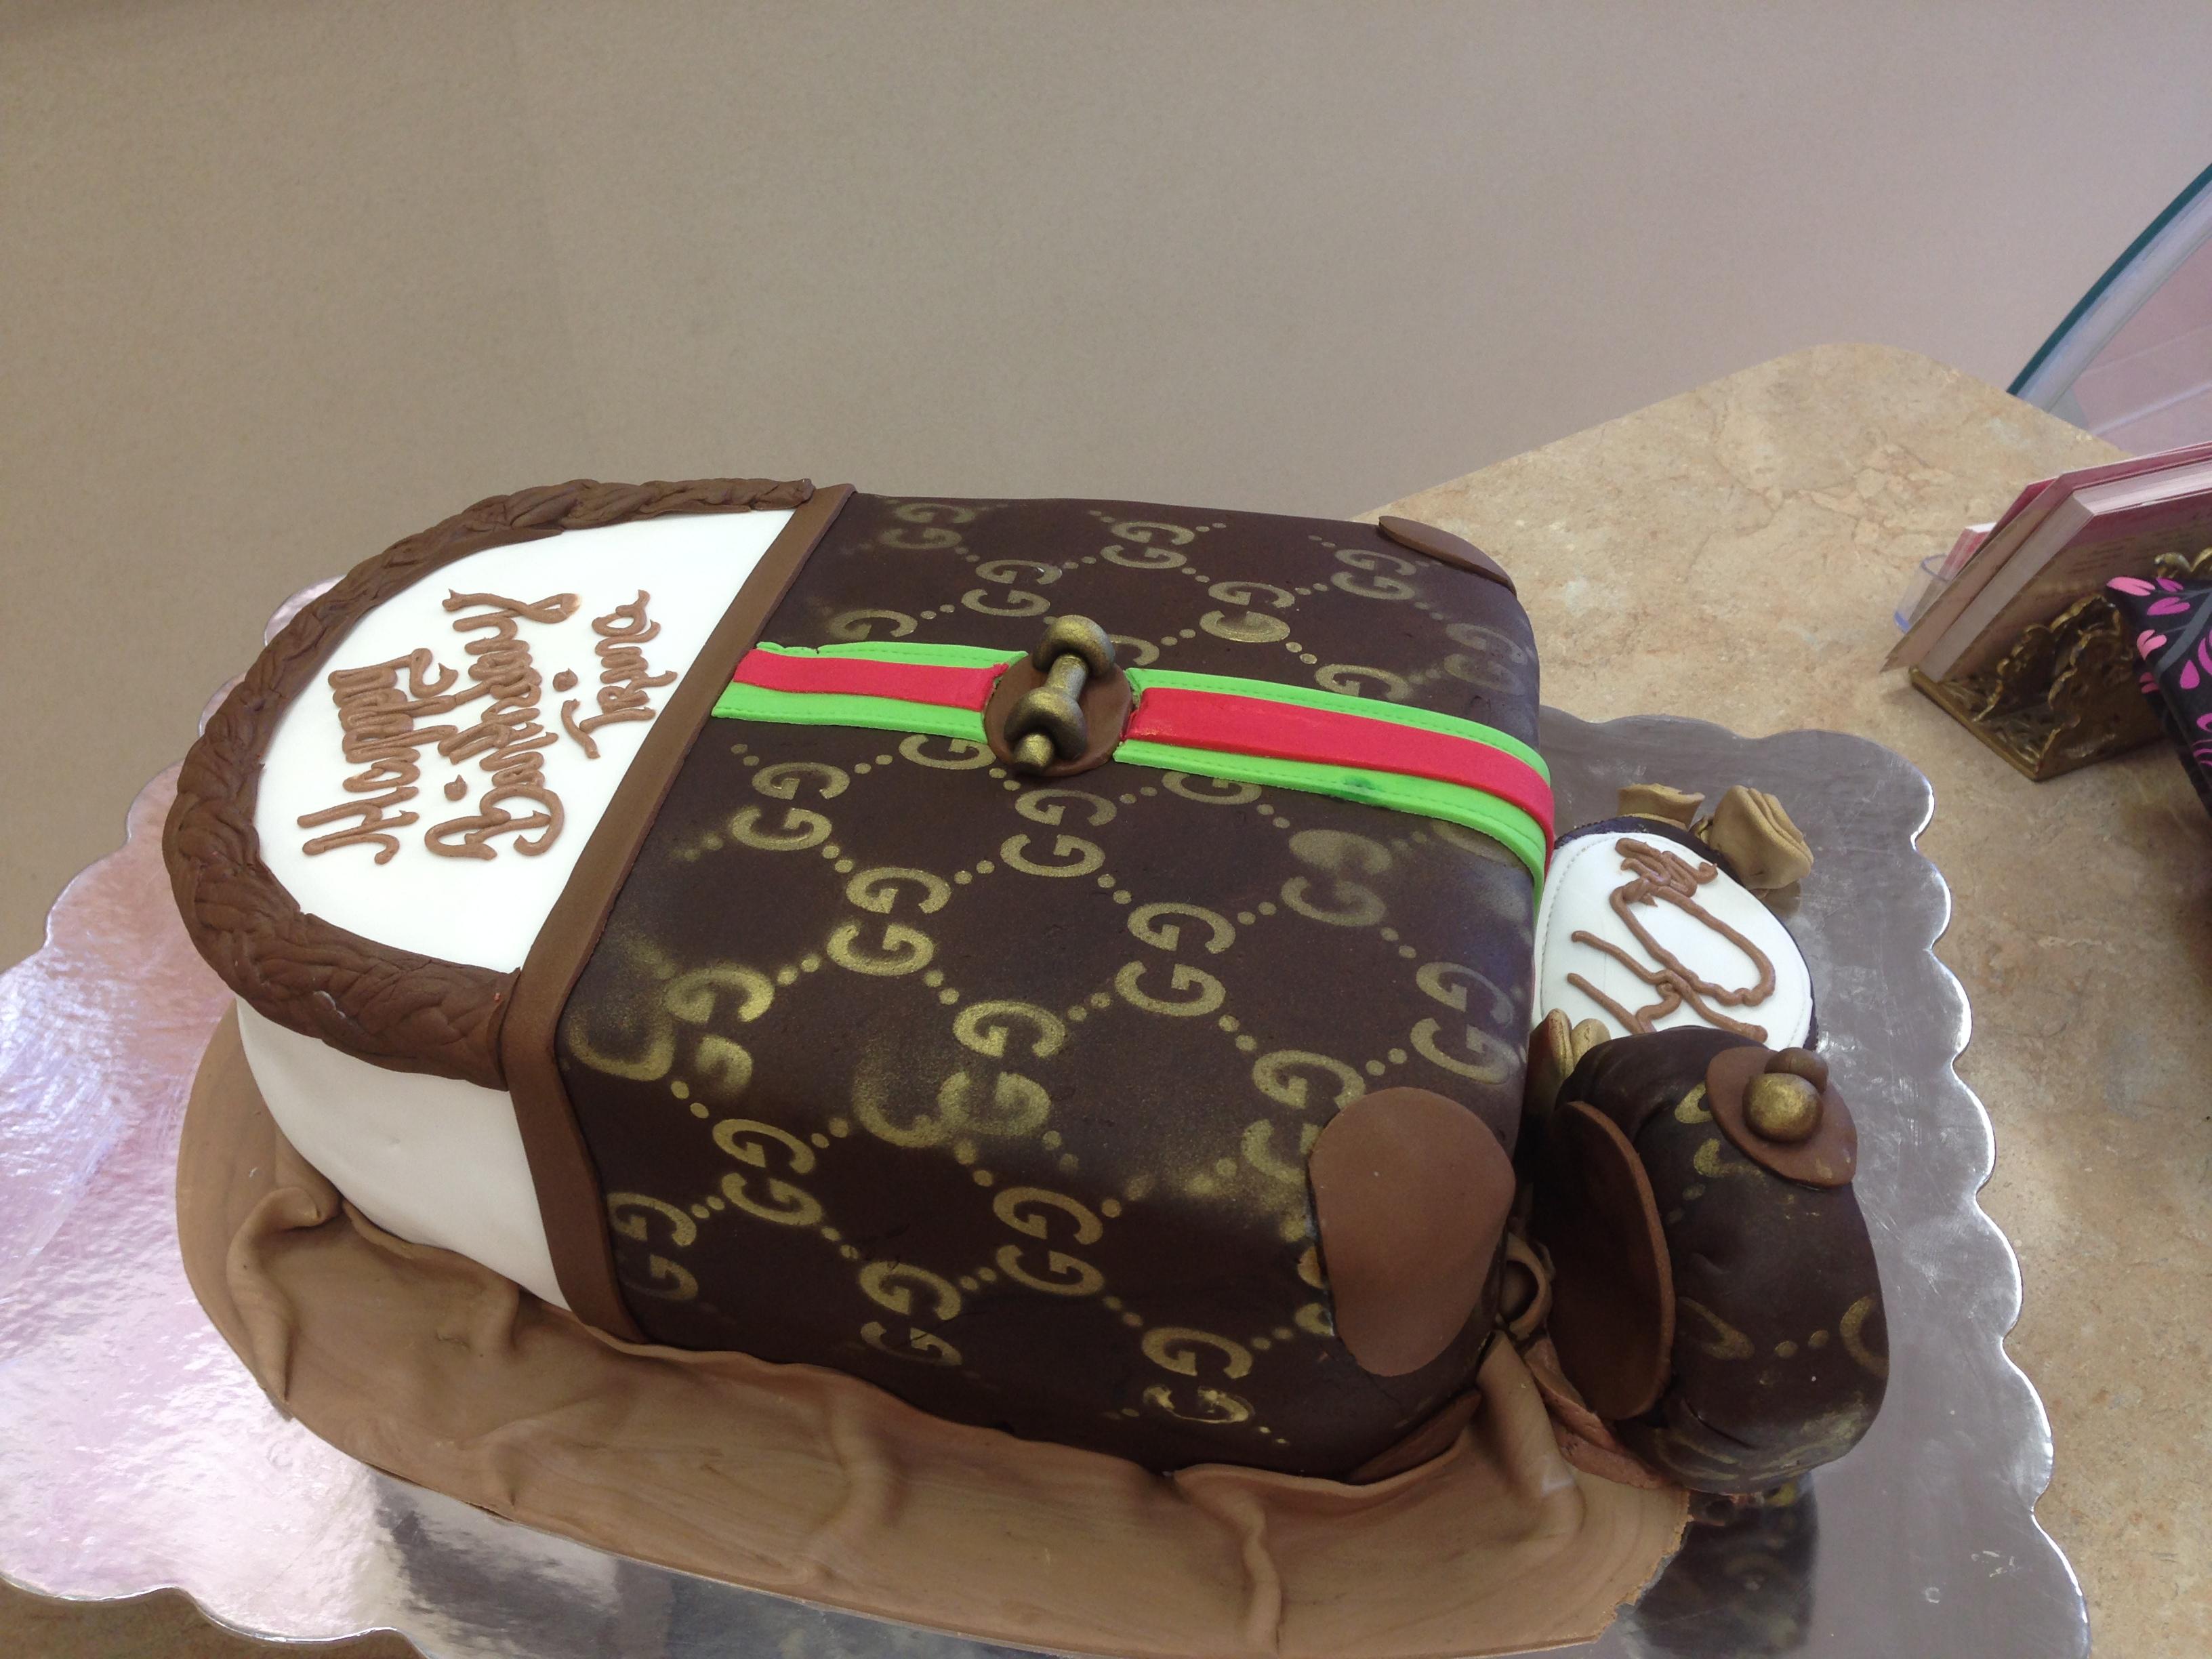 Gucci Handbag Cake